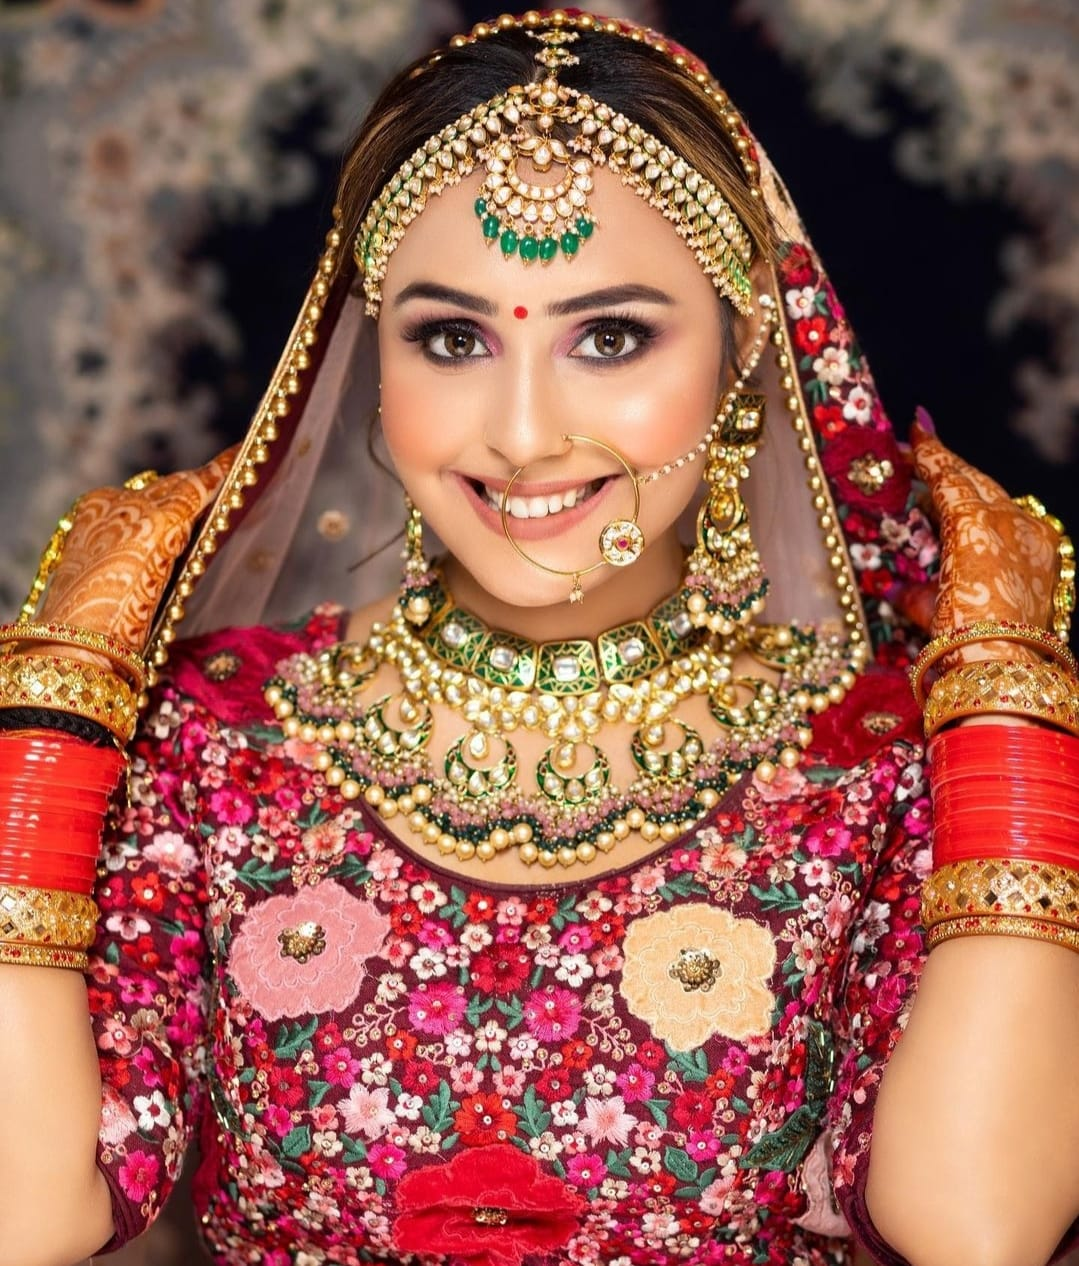 nagma-khan-makeup-artist-delhi-ncr